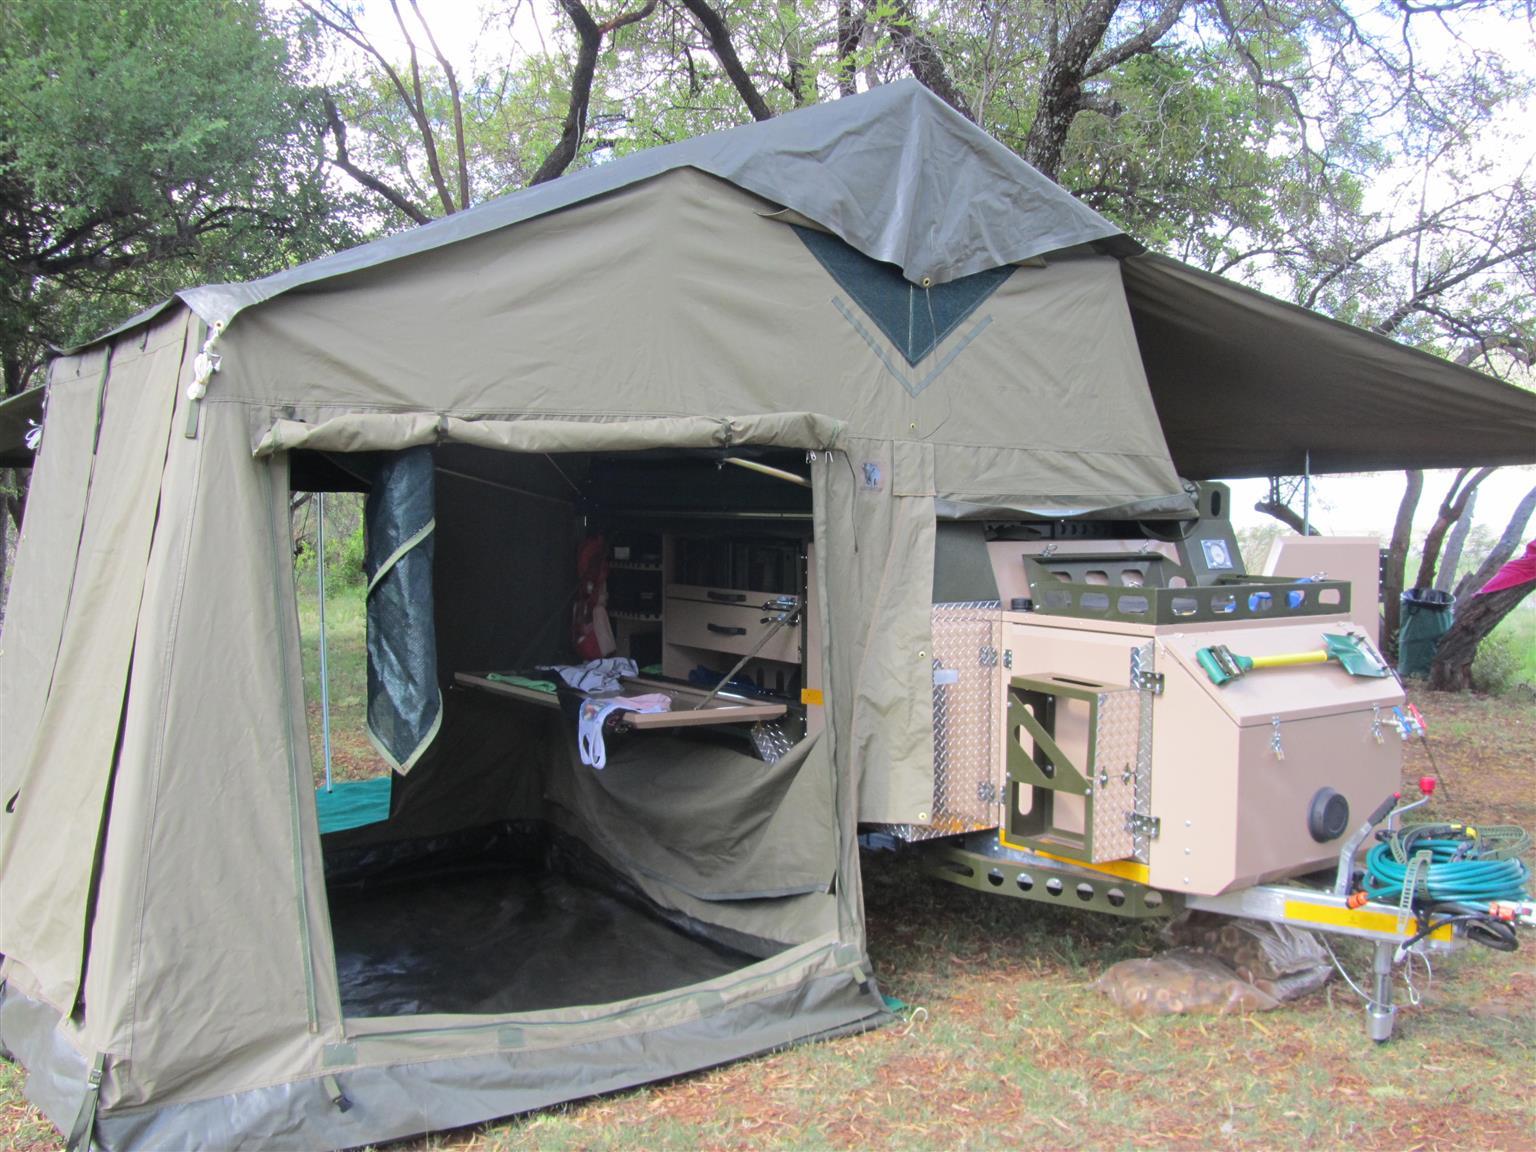 Conqueror Comfort camping trailer